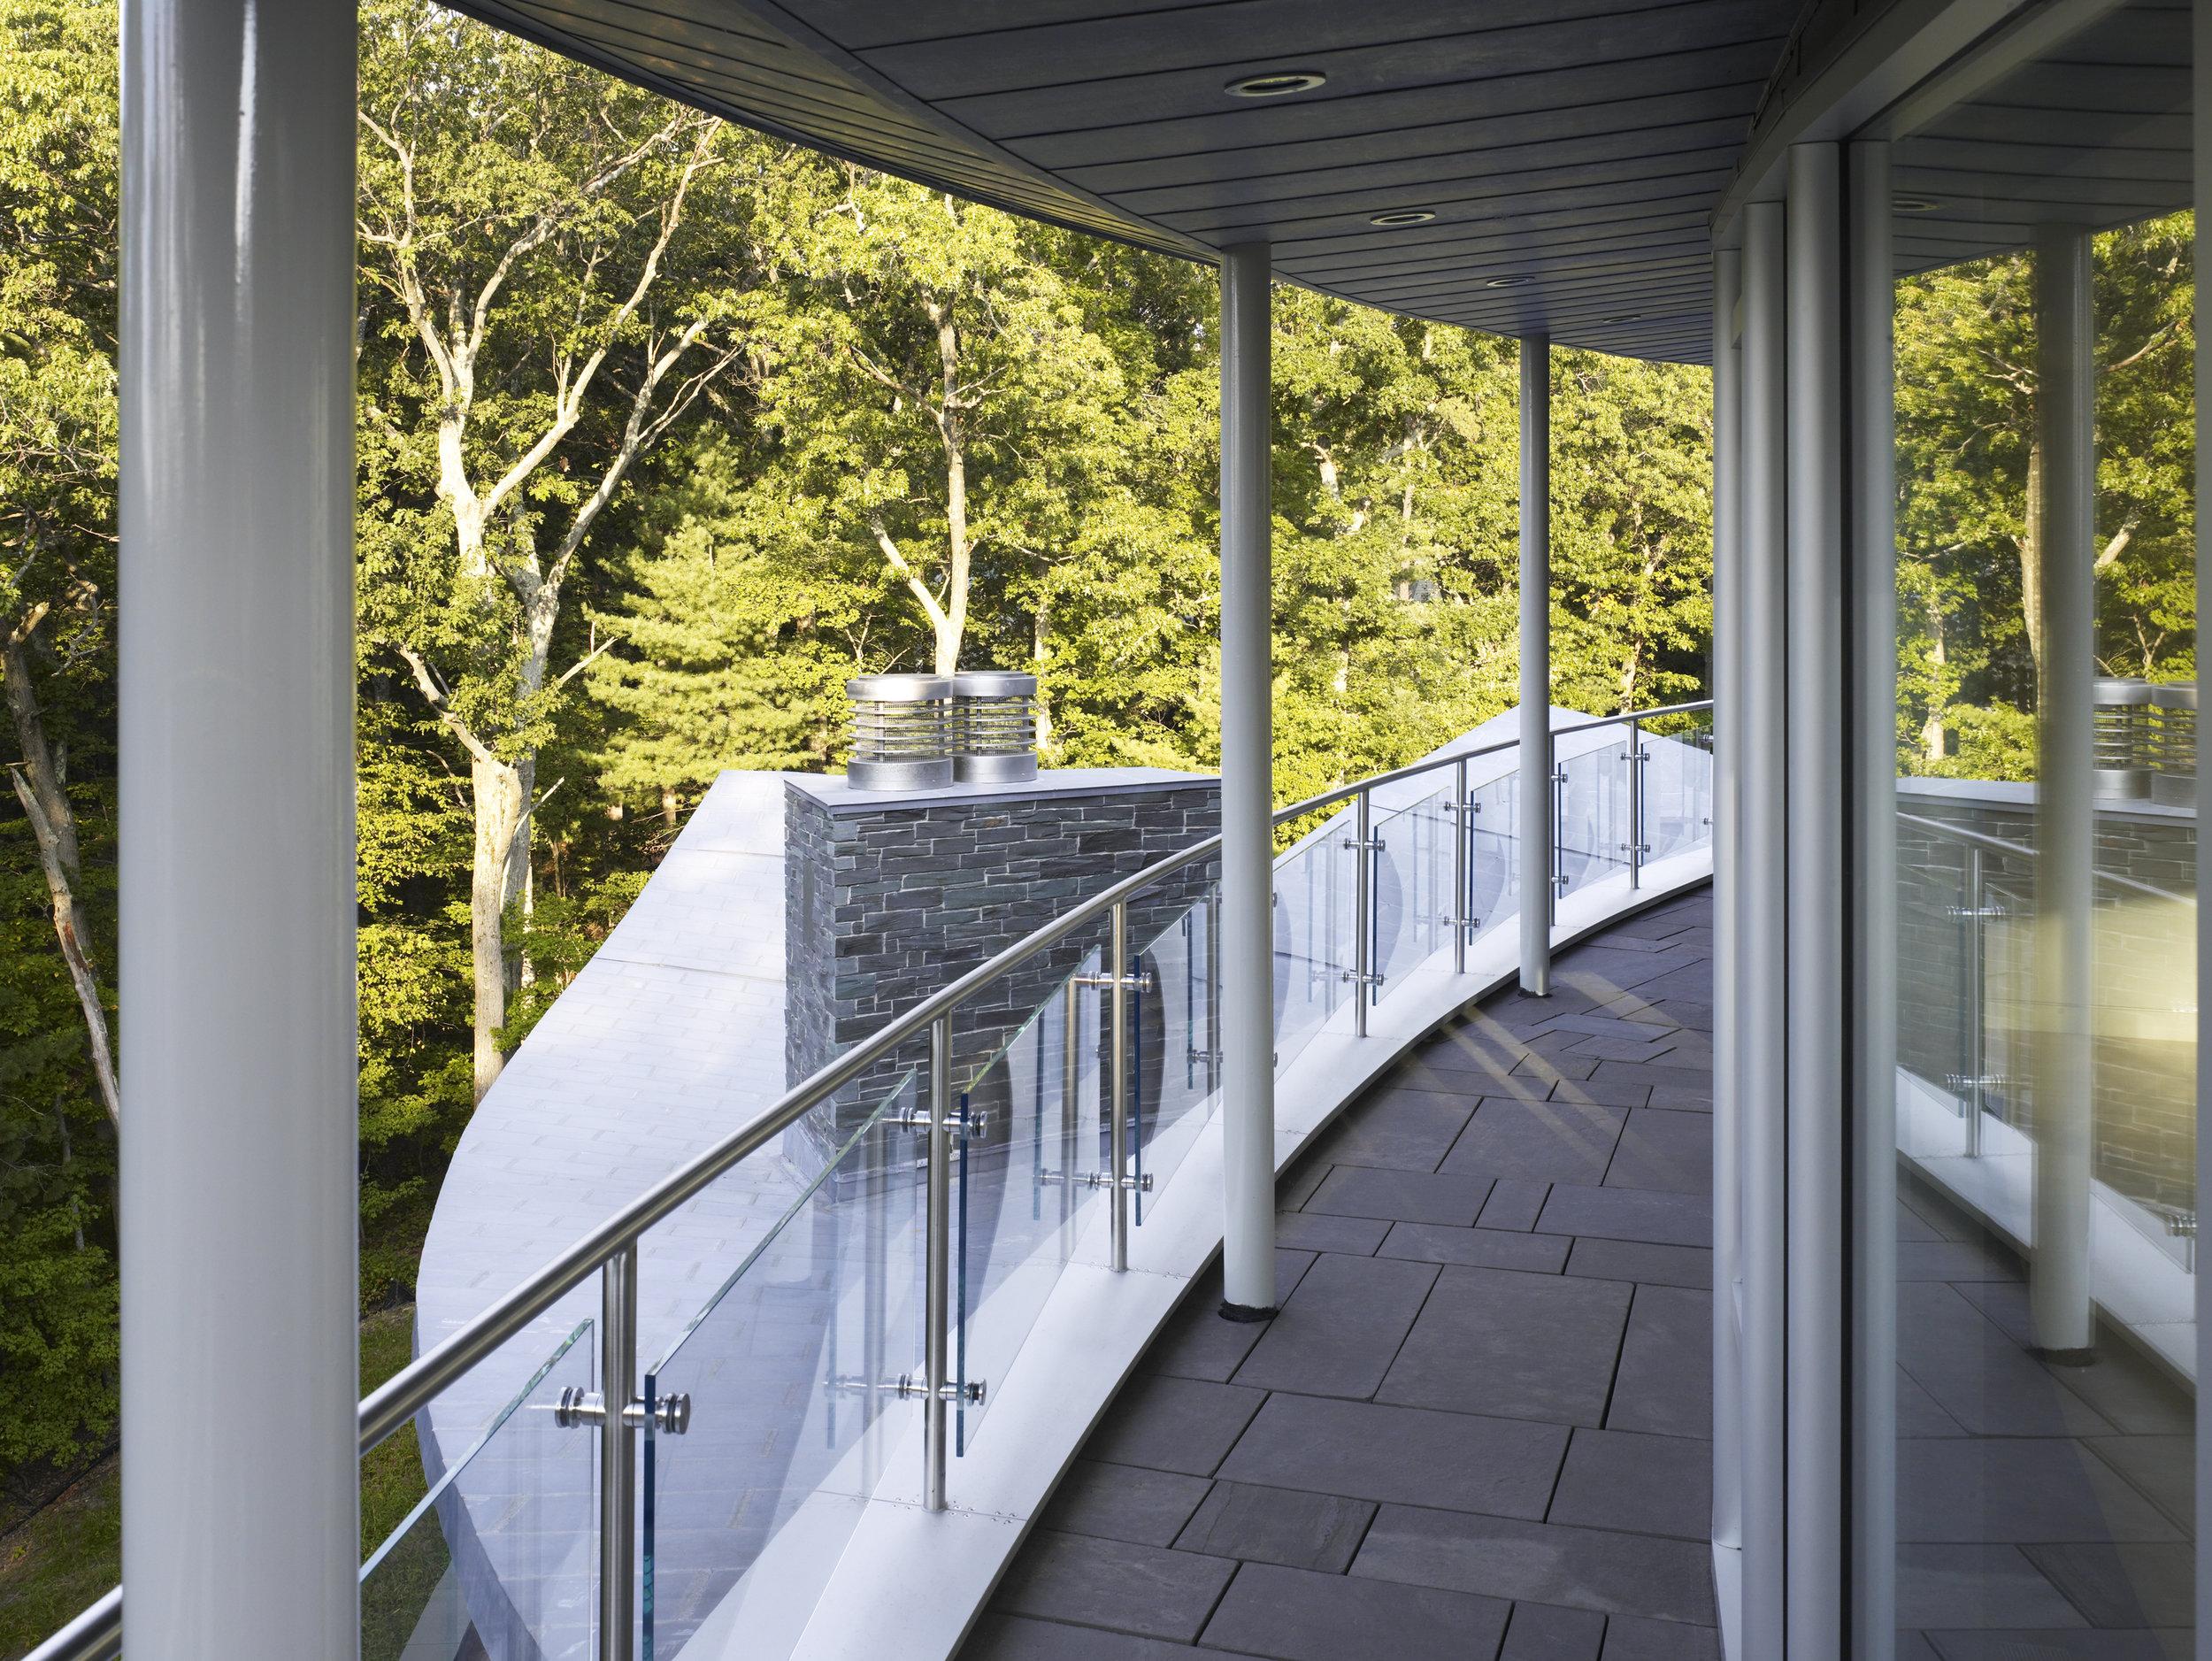 9901-ext-roof-terrace_119.jpg